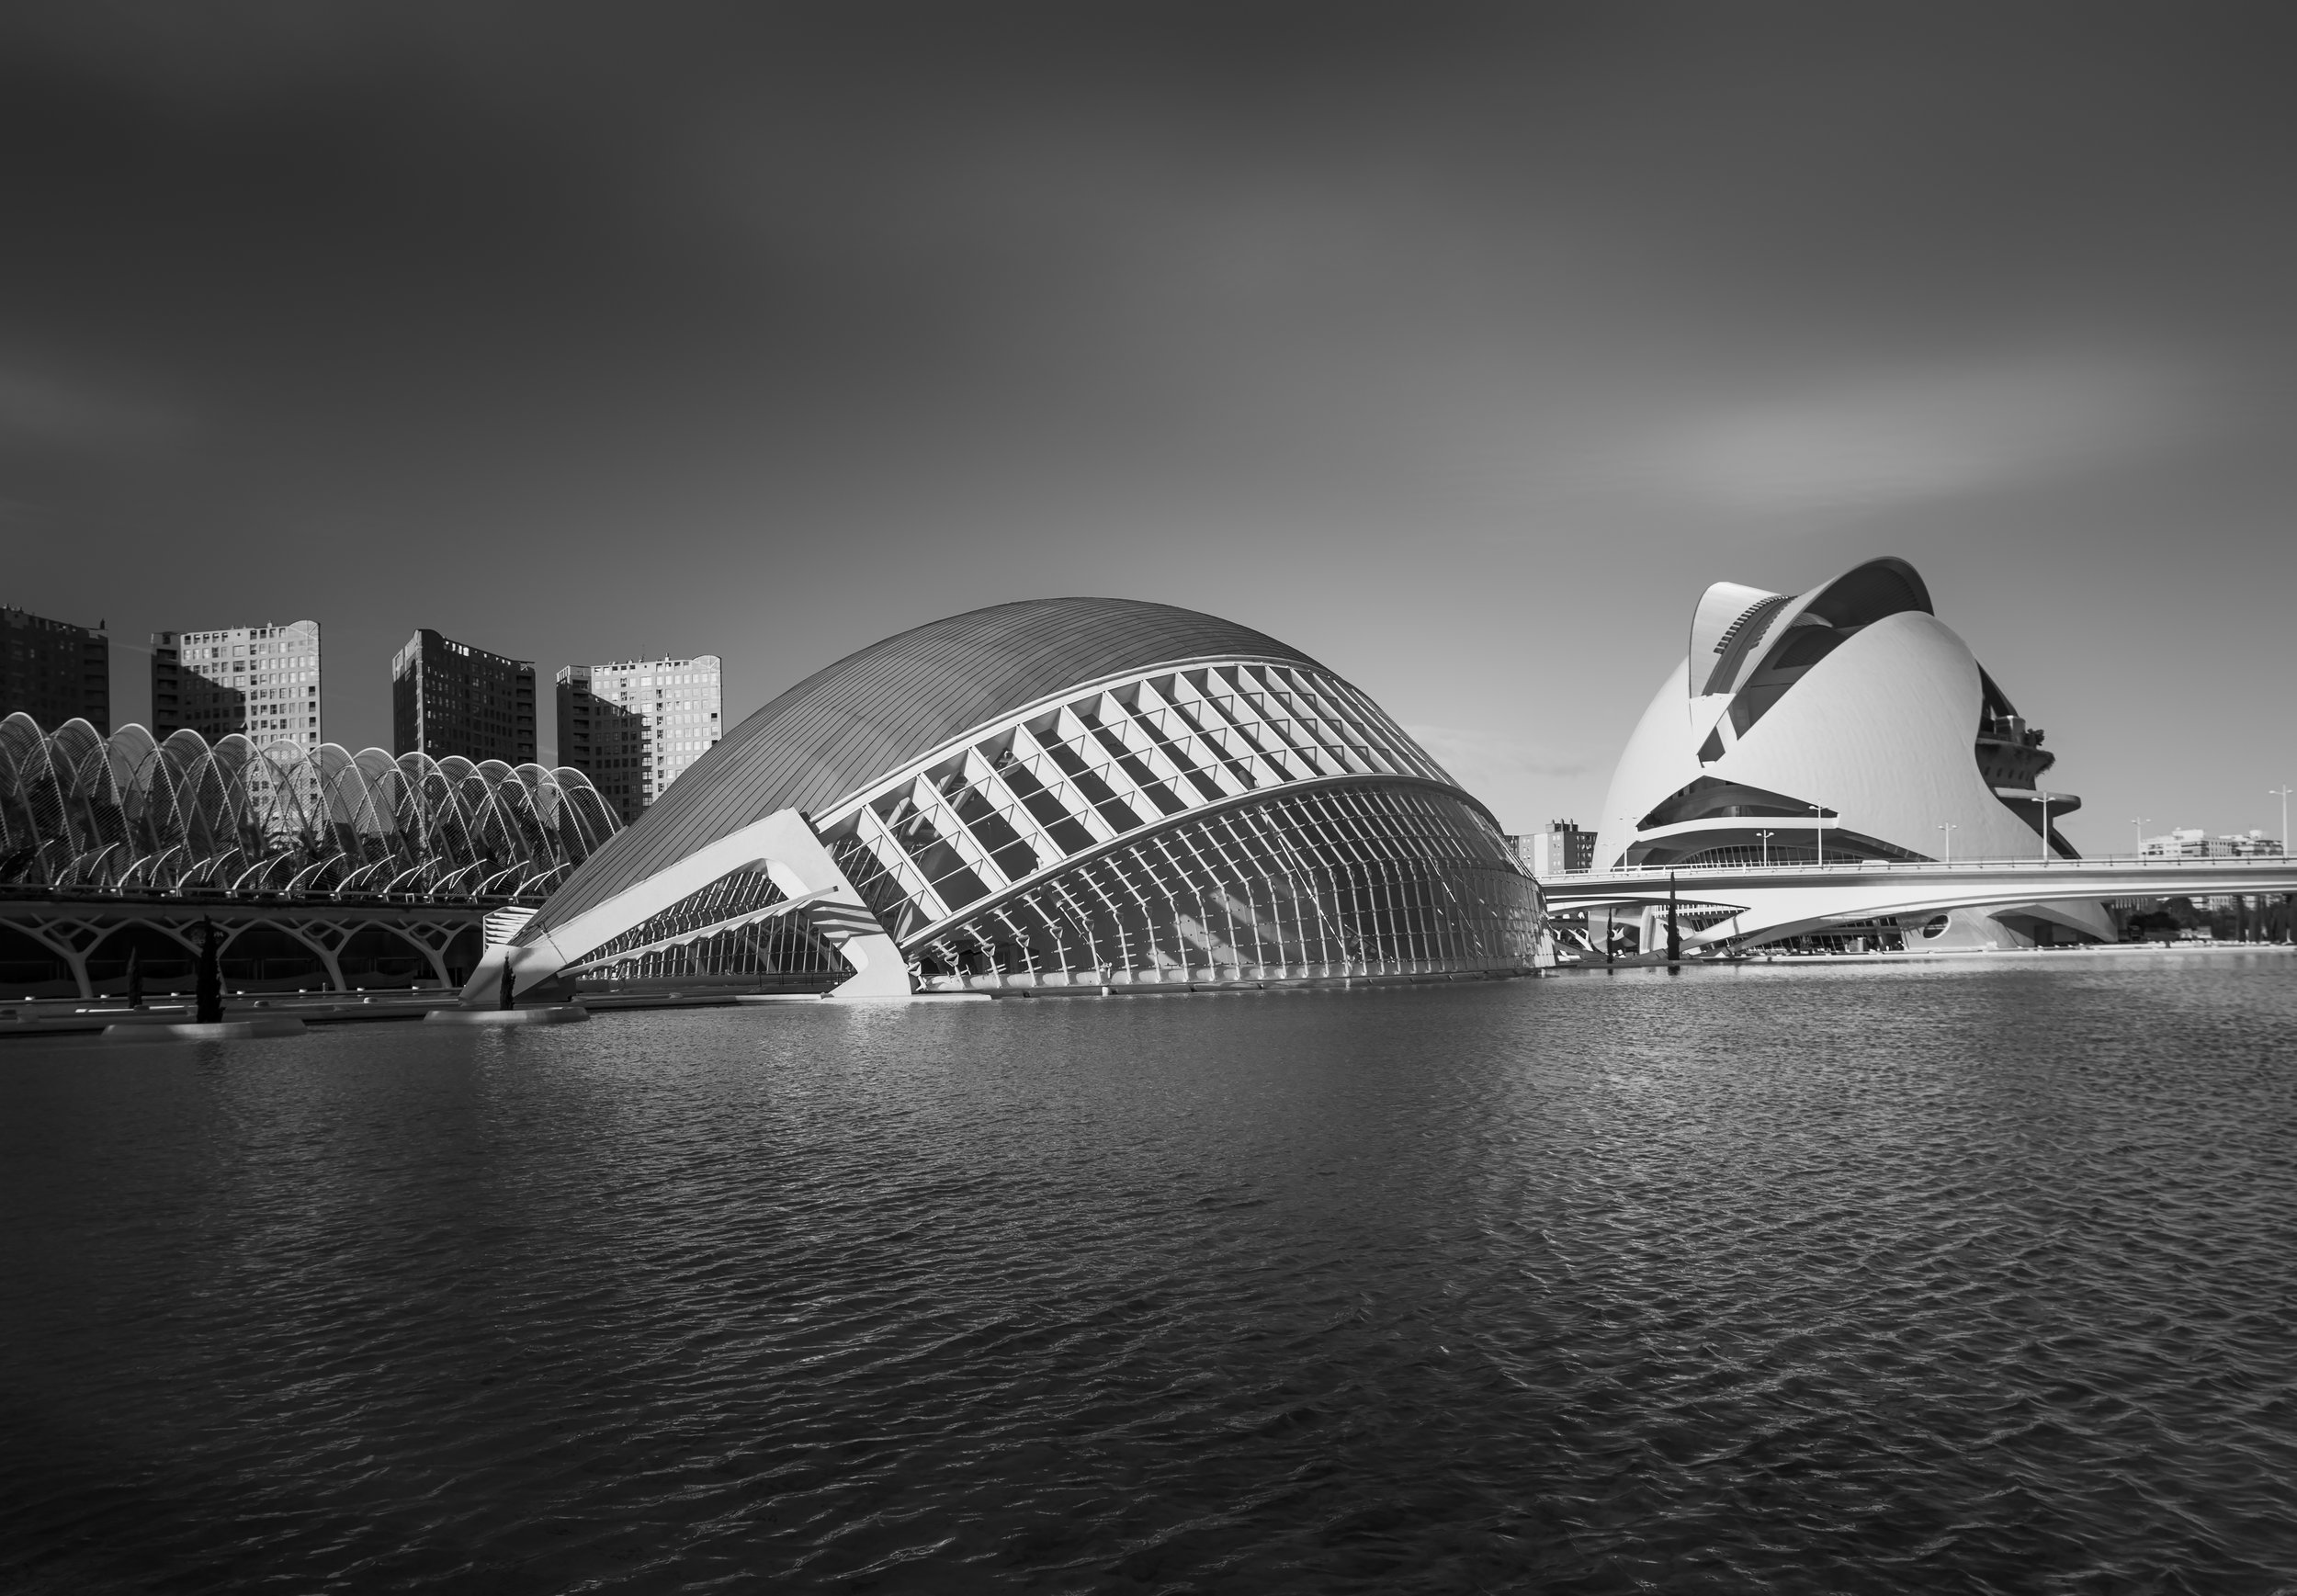 Calatrava-8558_new  version.jpg